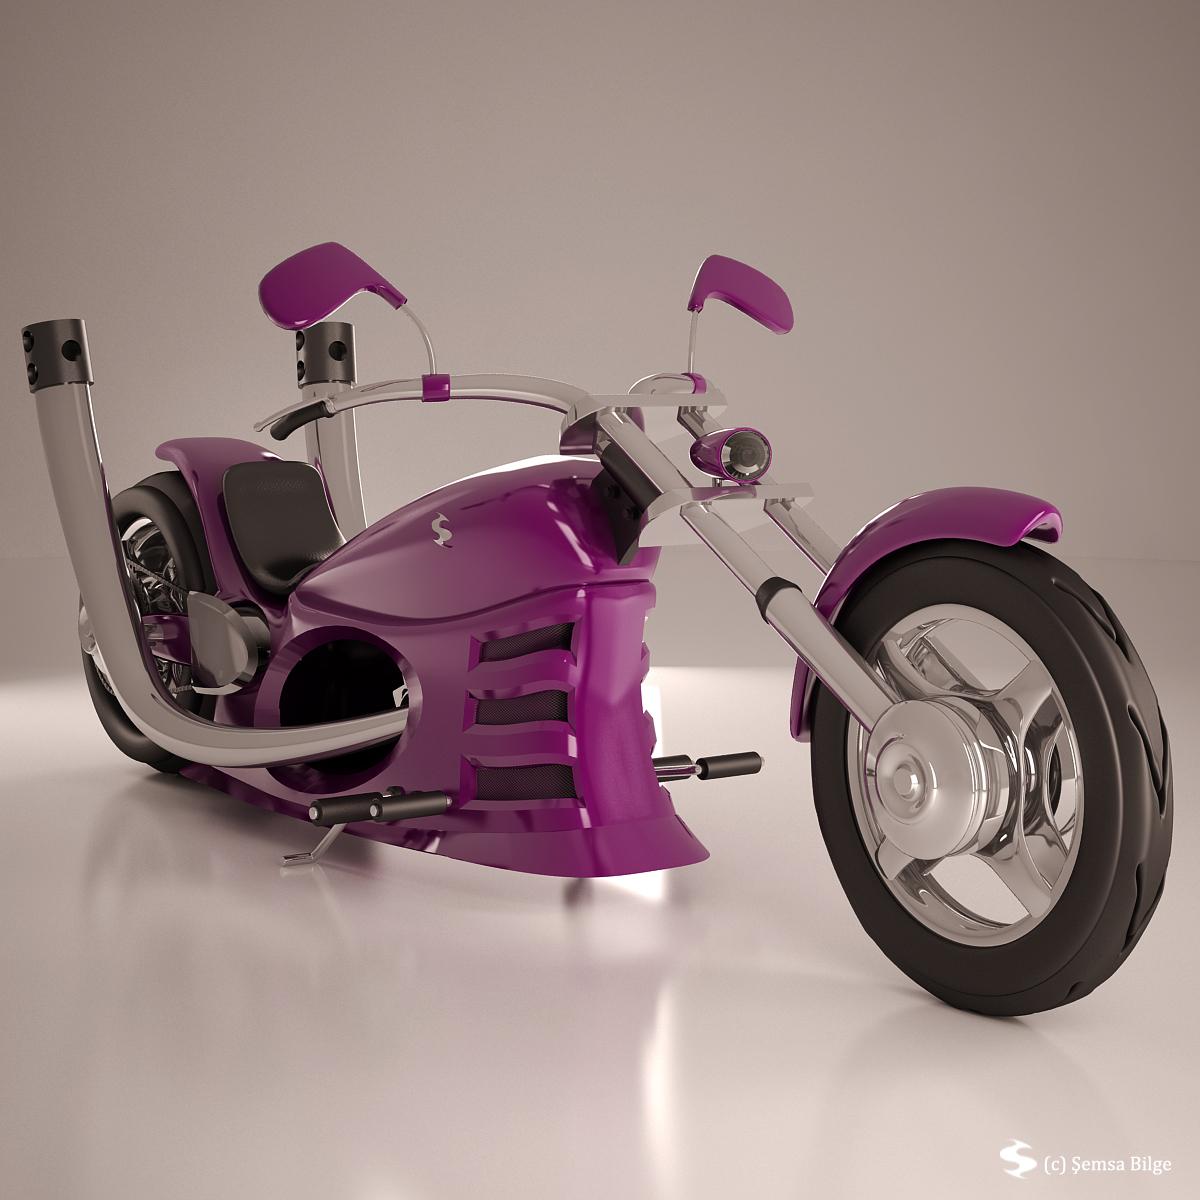 Chopper 01-04 by Semsa